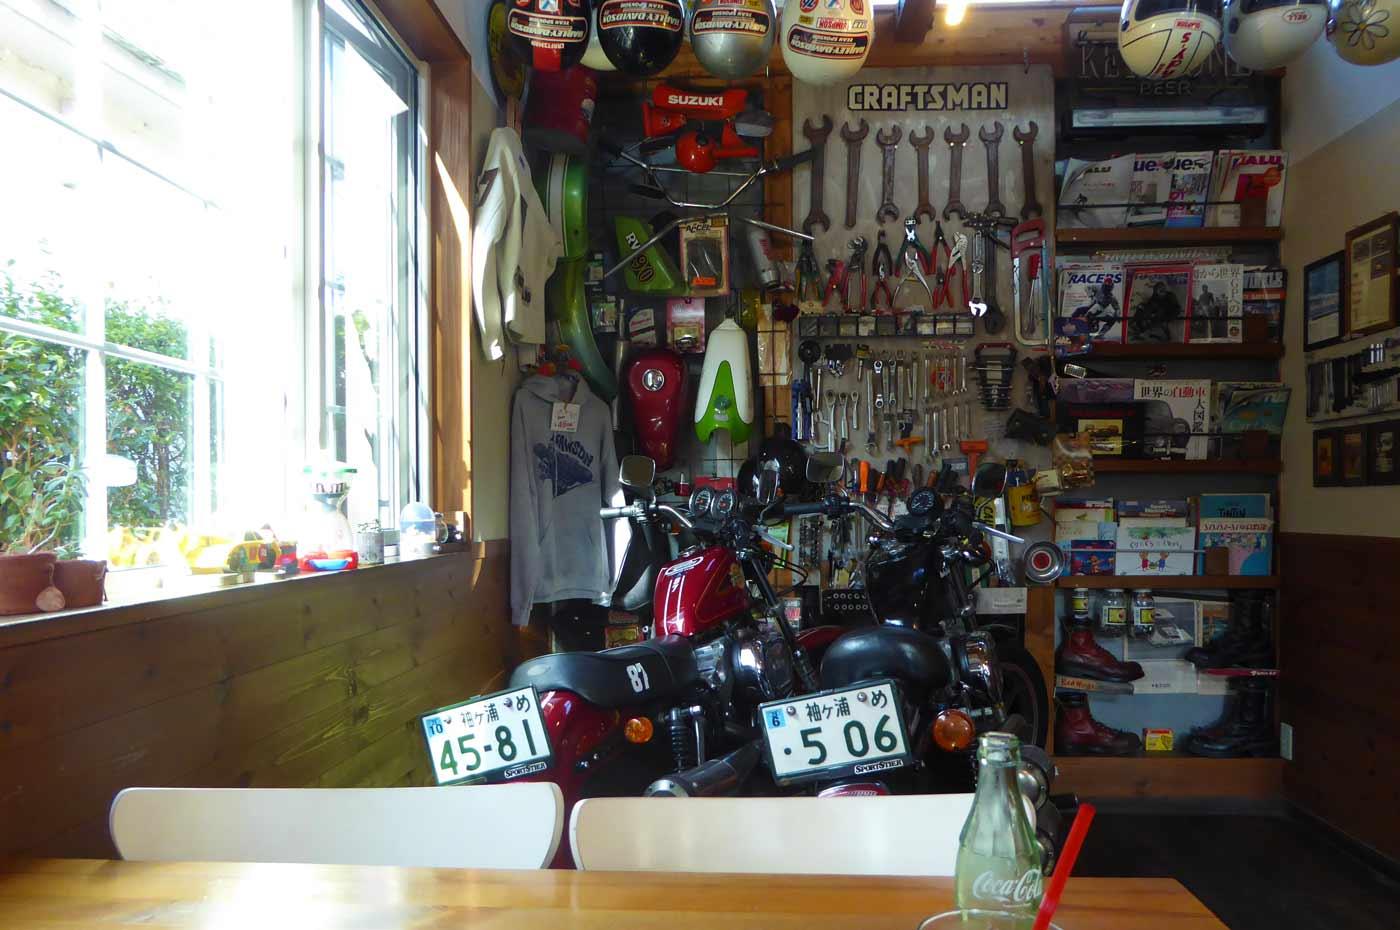 Indy'sのバイクの画像